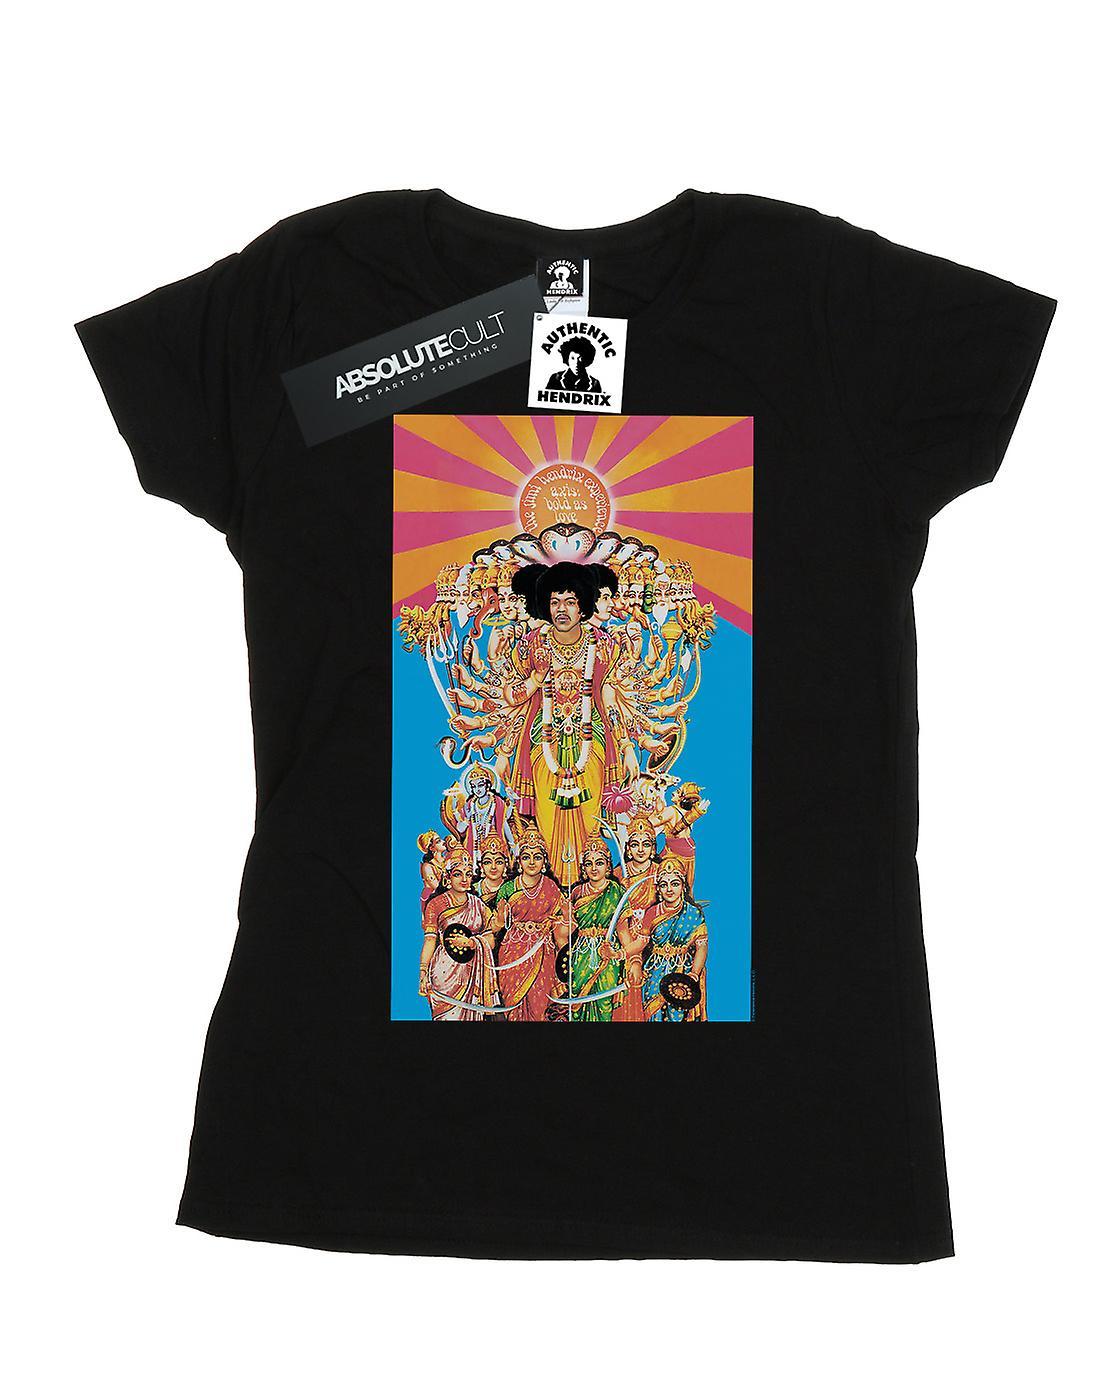 Jimi Hendrix Women's Axis Bold As Love T-Shirt